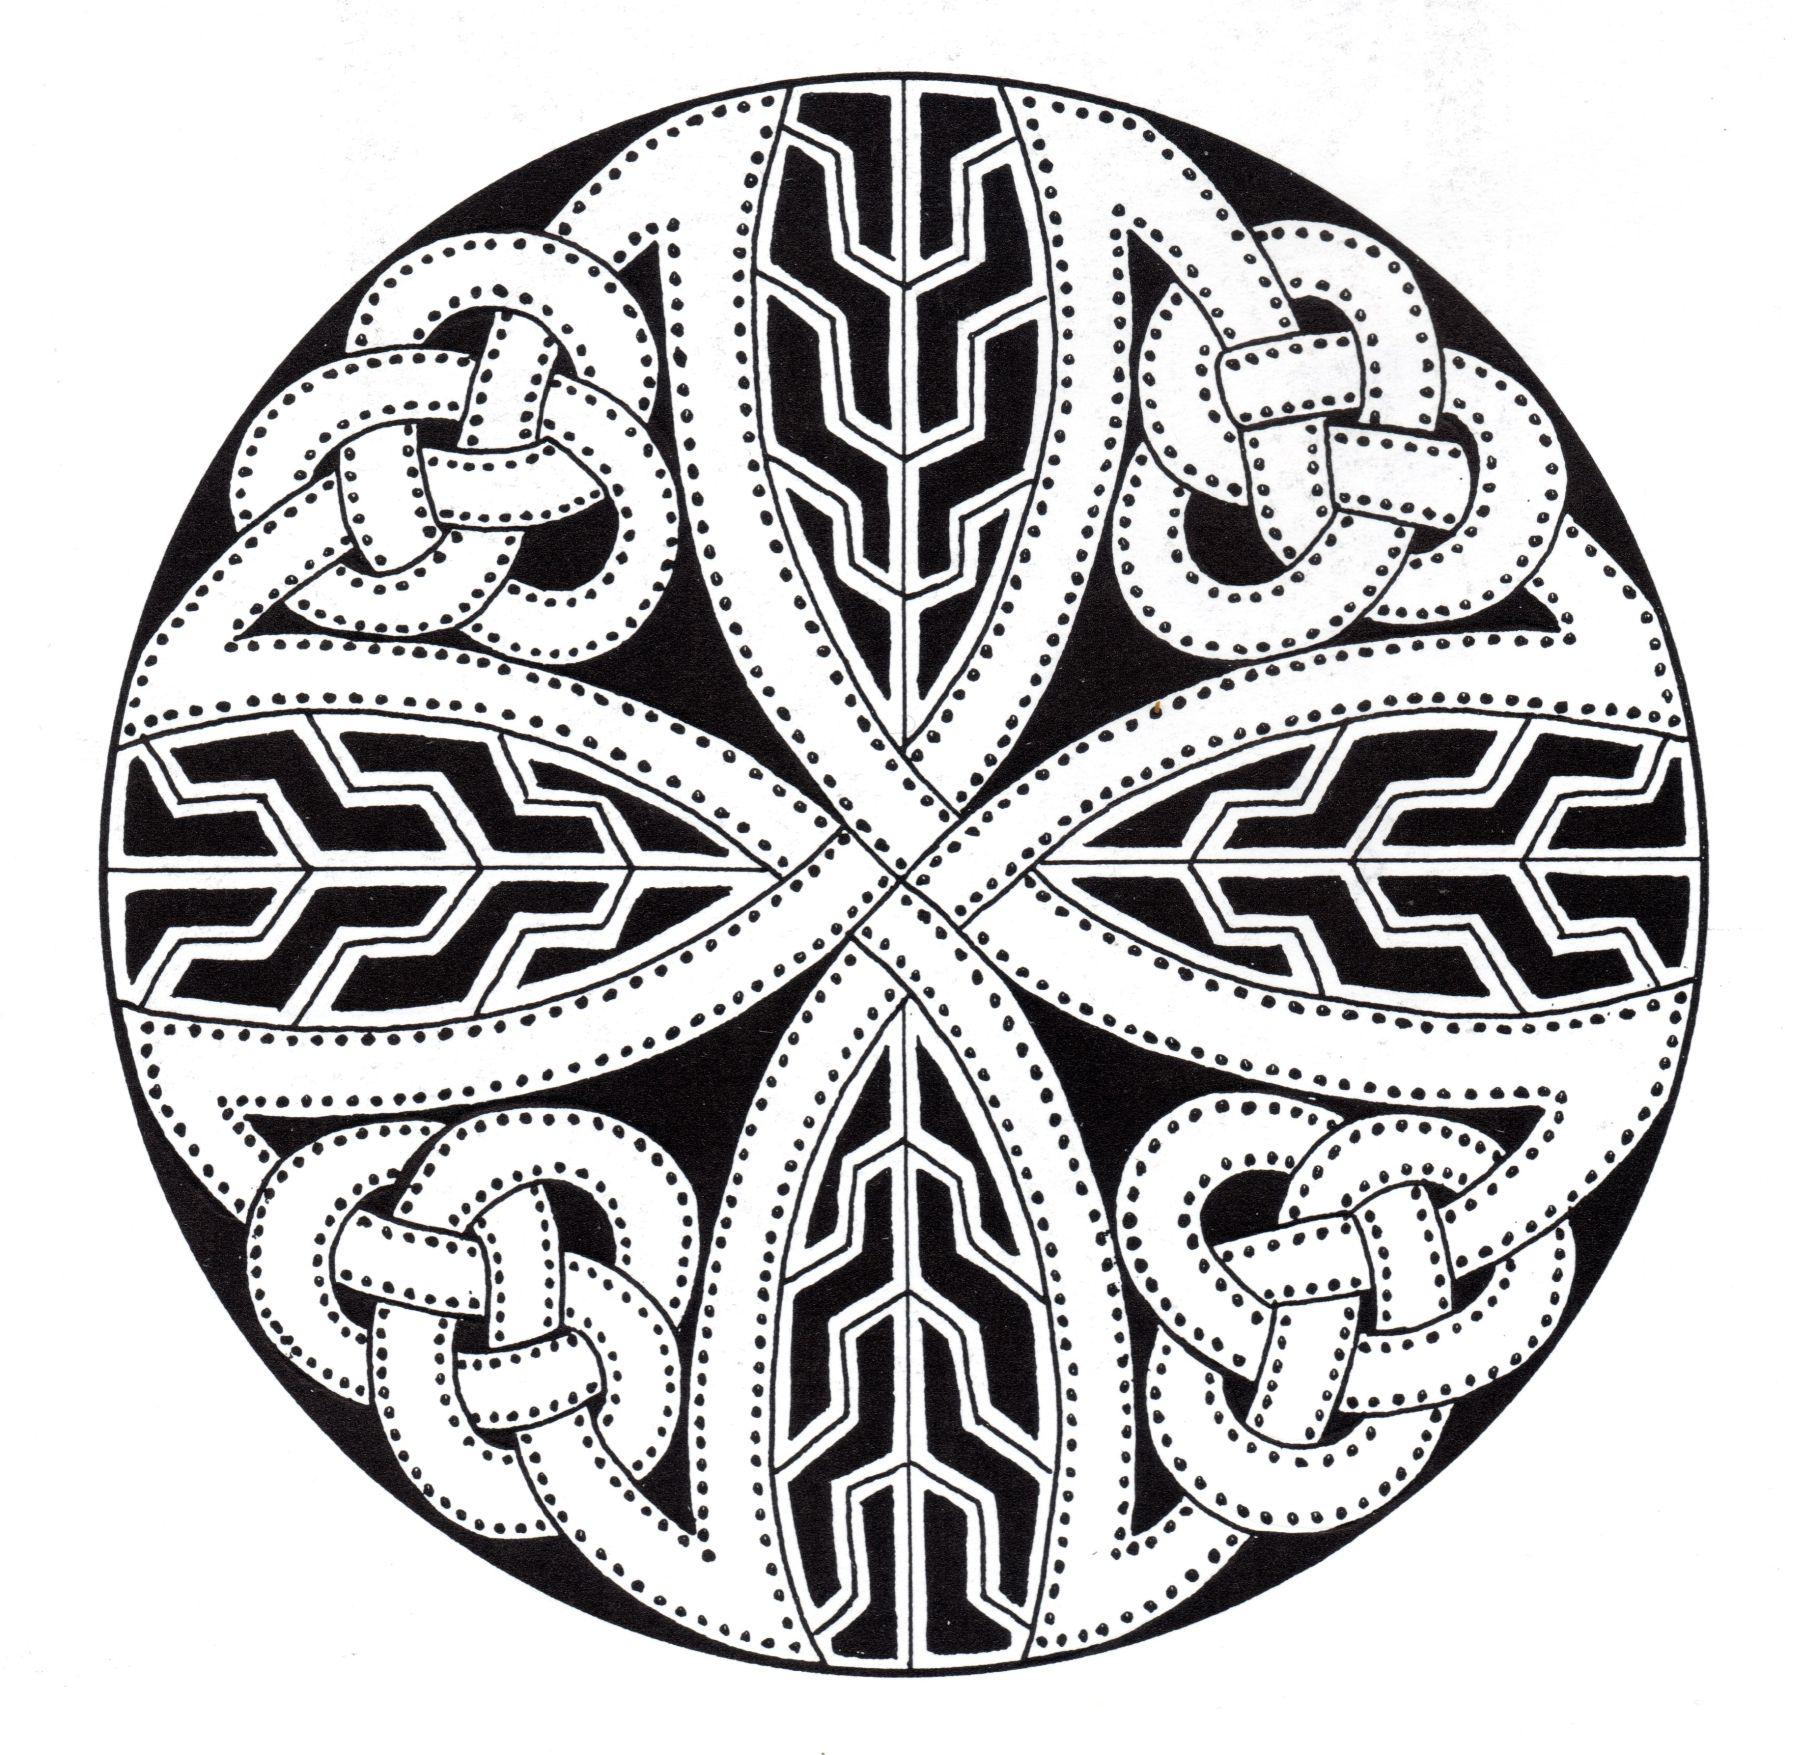 Complex abstract Celtic art design looking like a Mandala